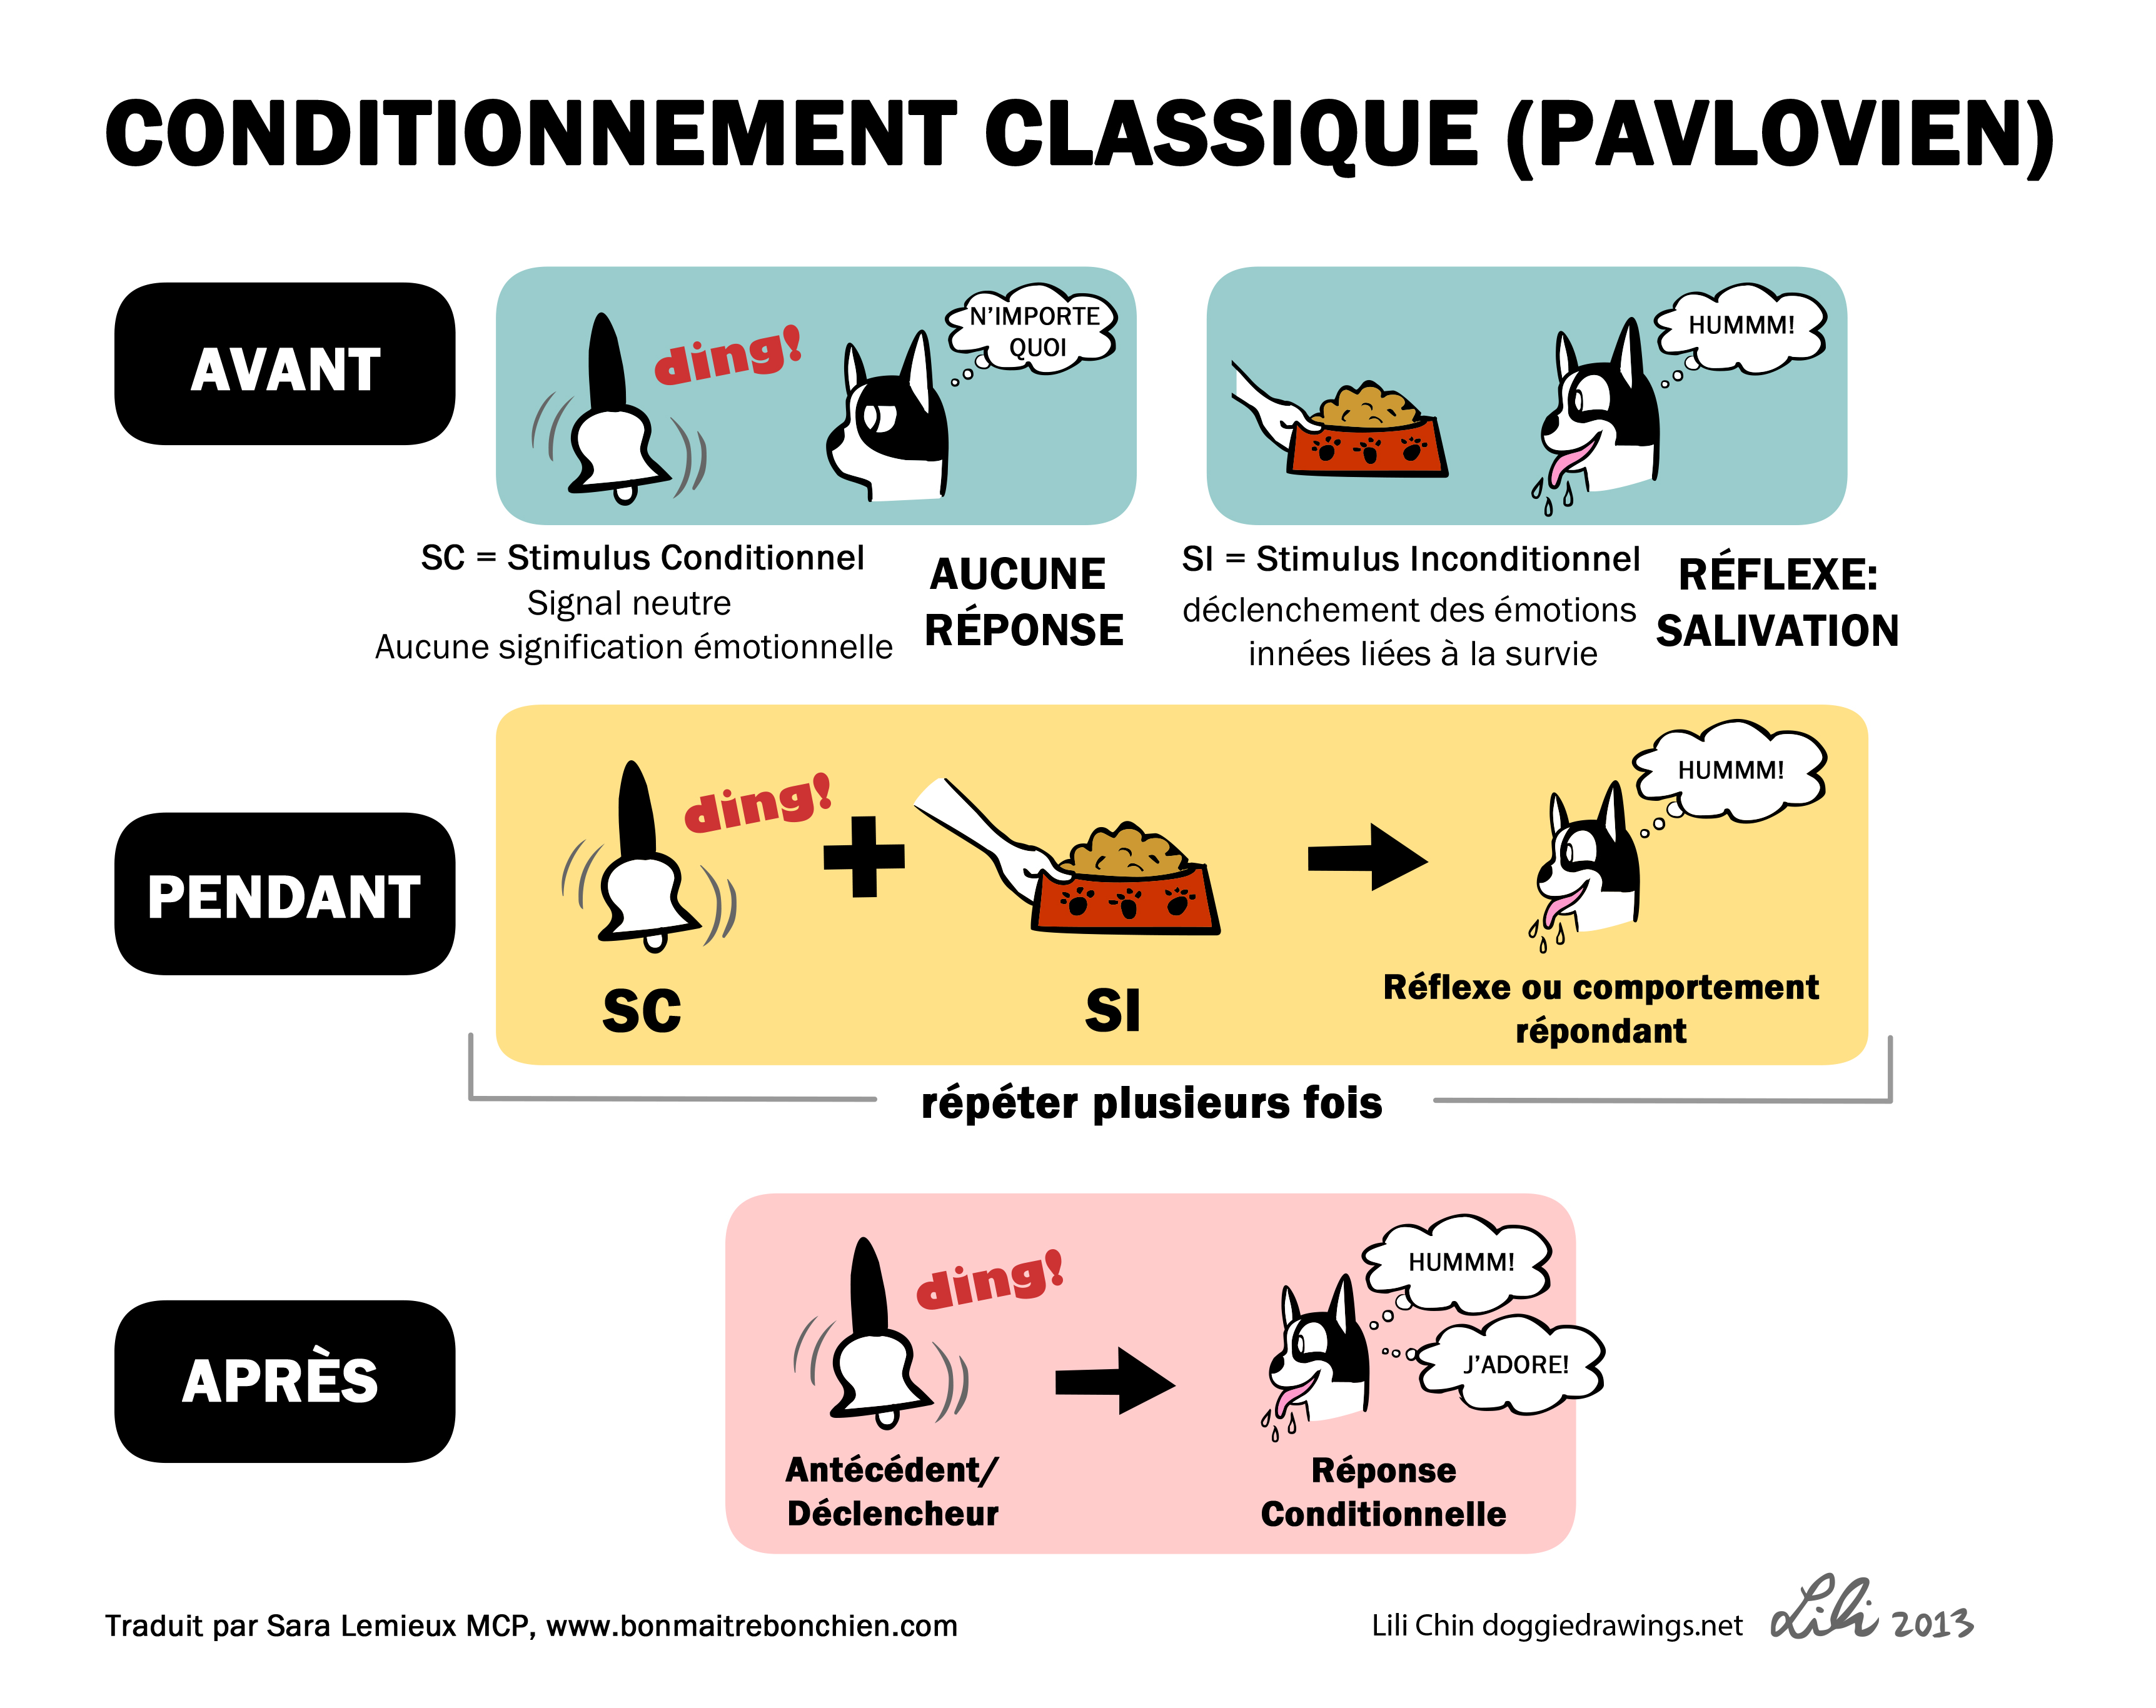 http://www.pension-77.fr/wp-content/uploads/2014/11/Image-Doggie-Drawings-conditionnement-classique.jpg